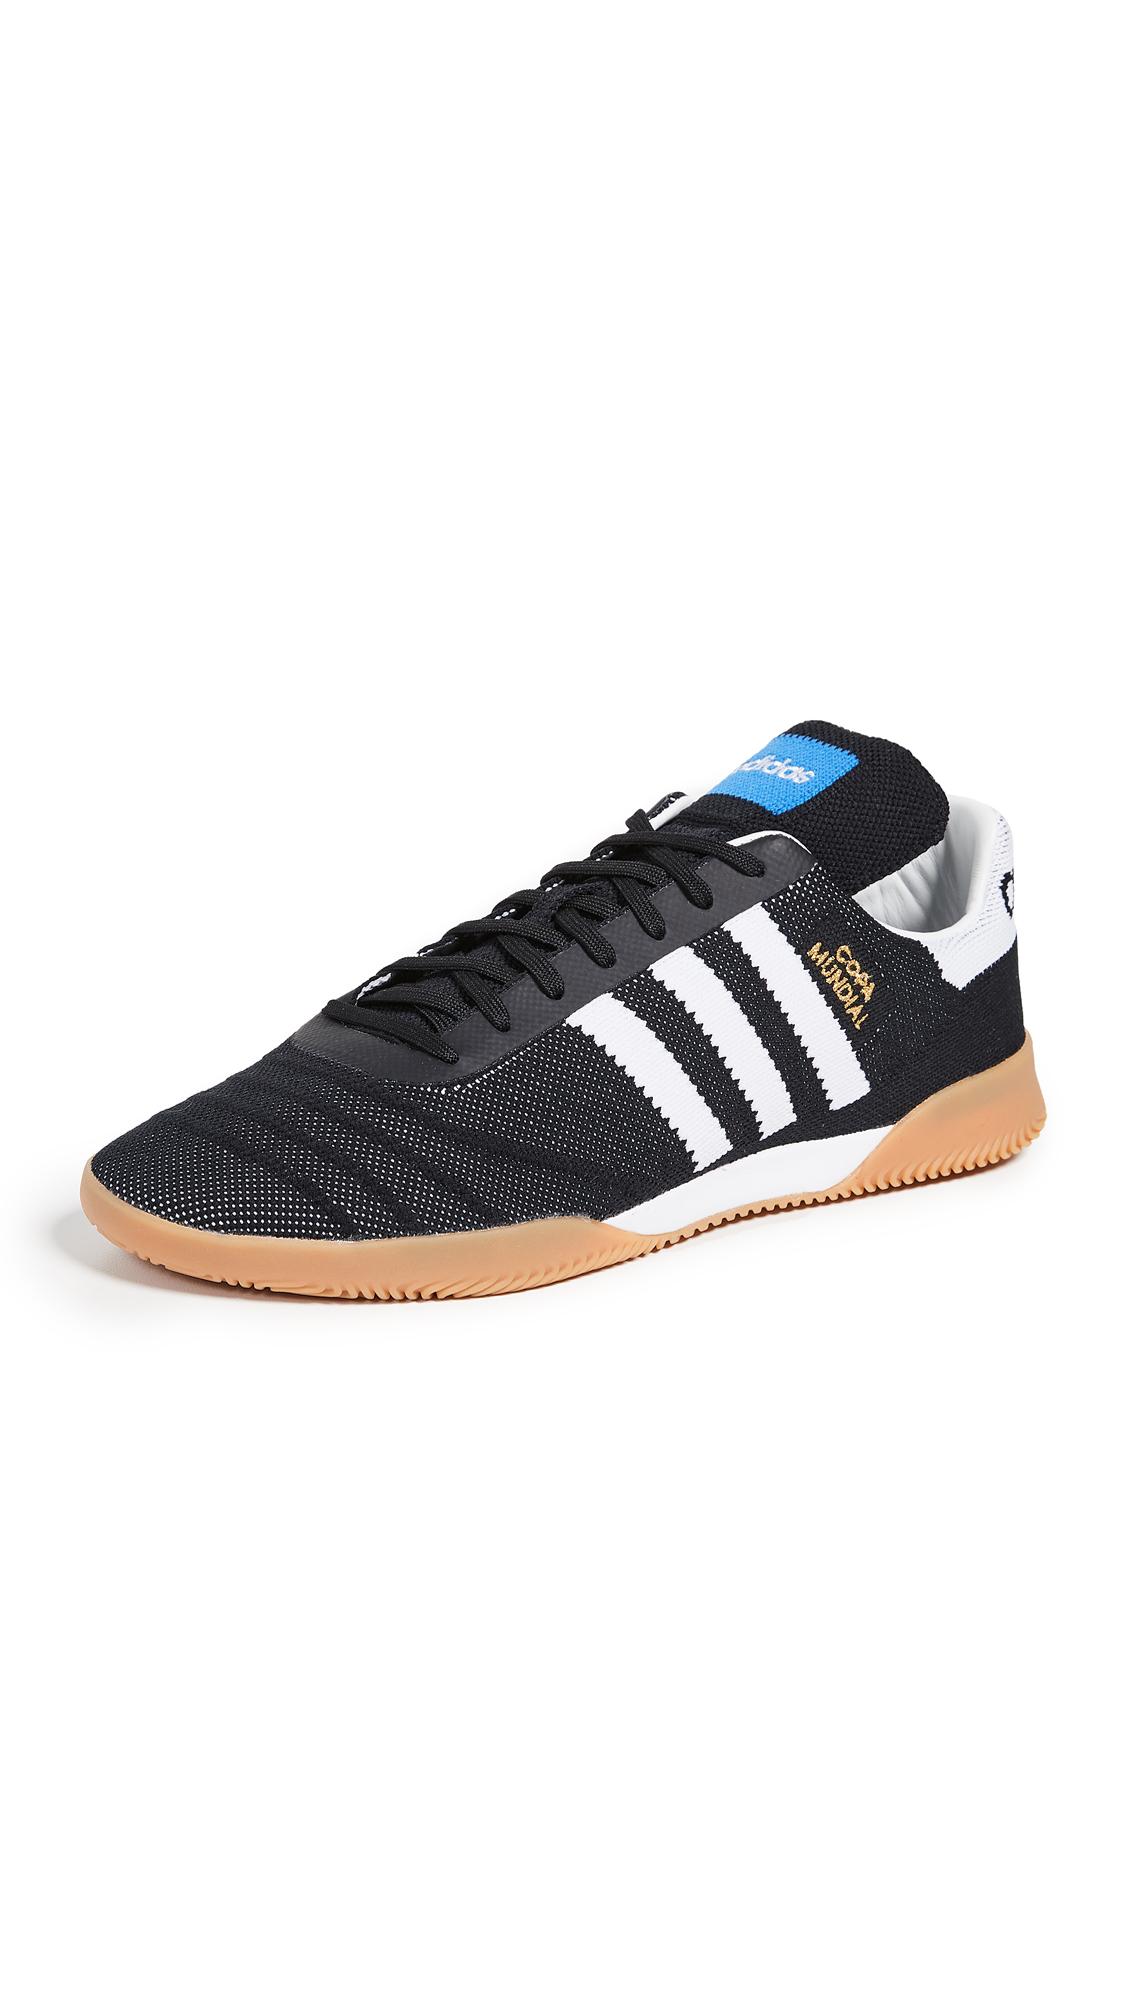 4e2aa2bc5 Adidas X Football Copa 70 Year Sneakers In Core Black   ModeSens